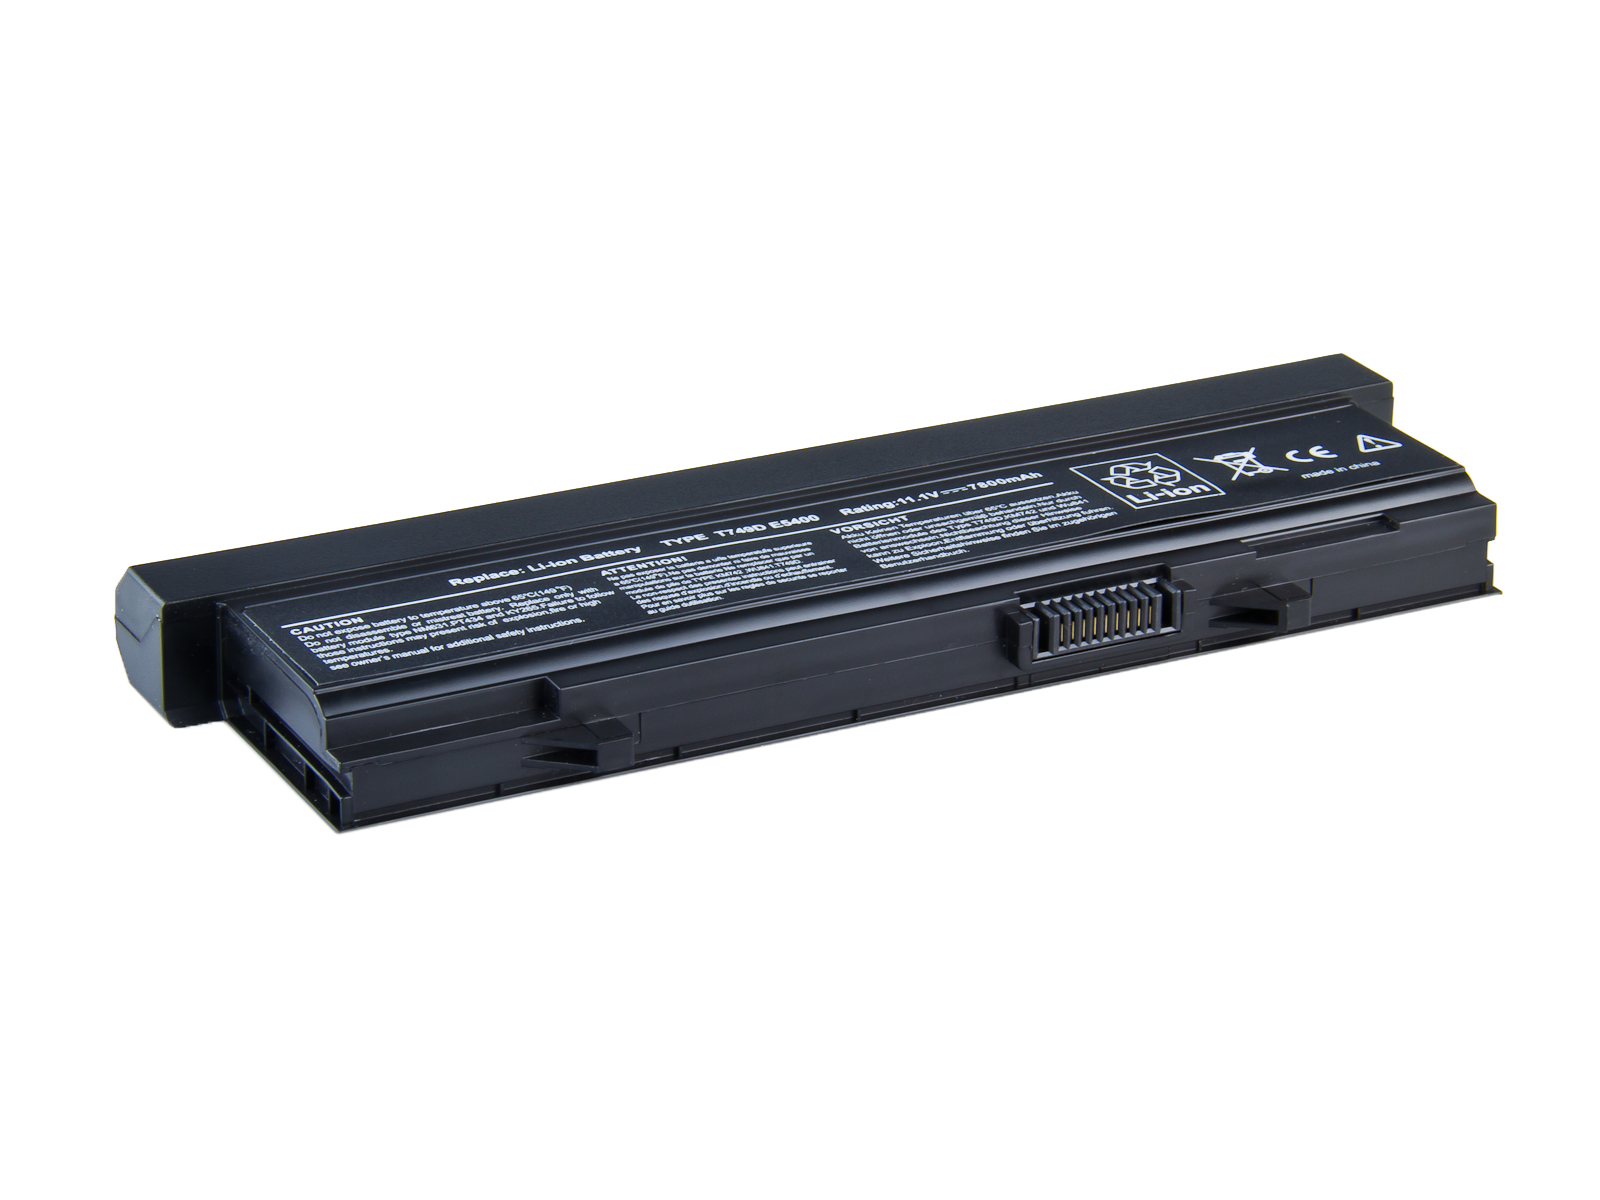 Náhradní baterie AVACOM Dell Latitude E5500, E5400 Li-ion 11,1V 7800mAh